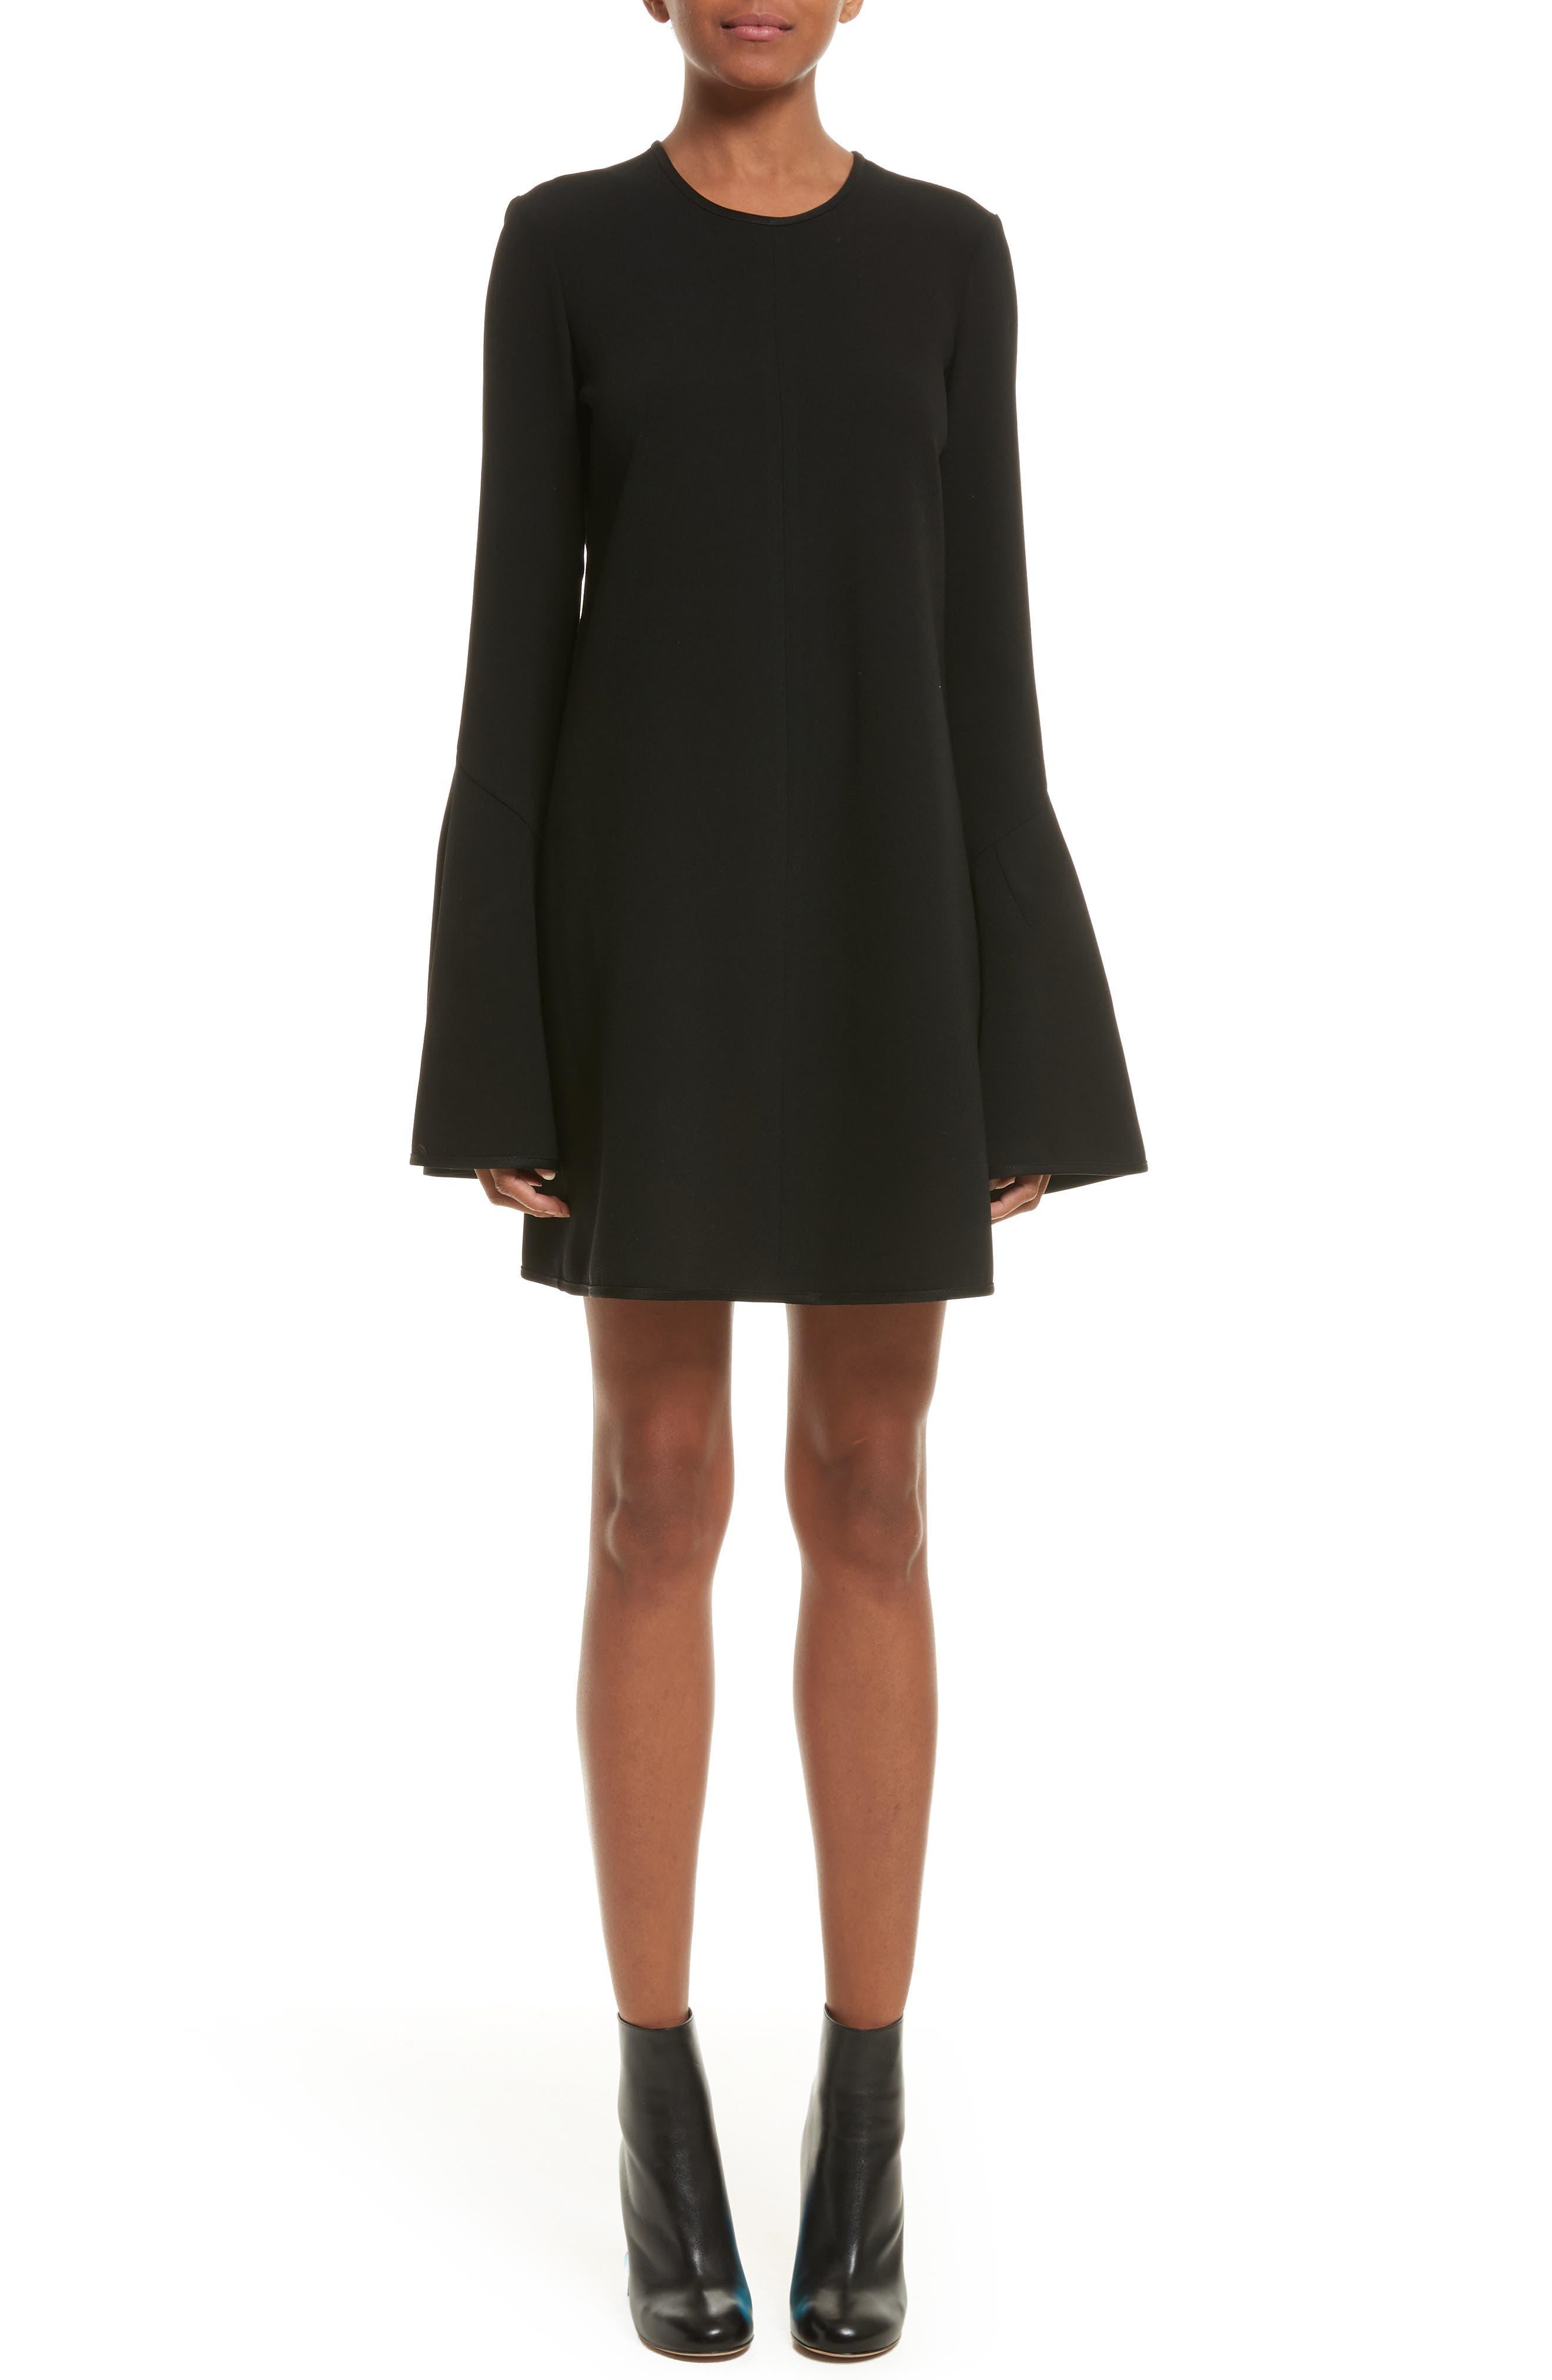 Preacher Satin Crepe Dress,                         Main,                         color, Black